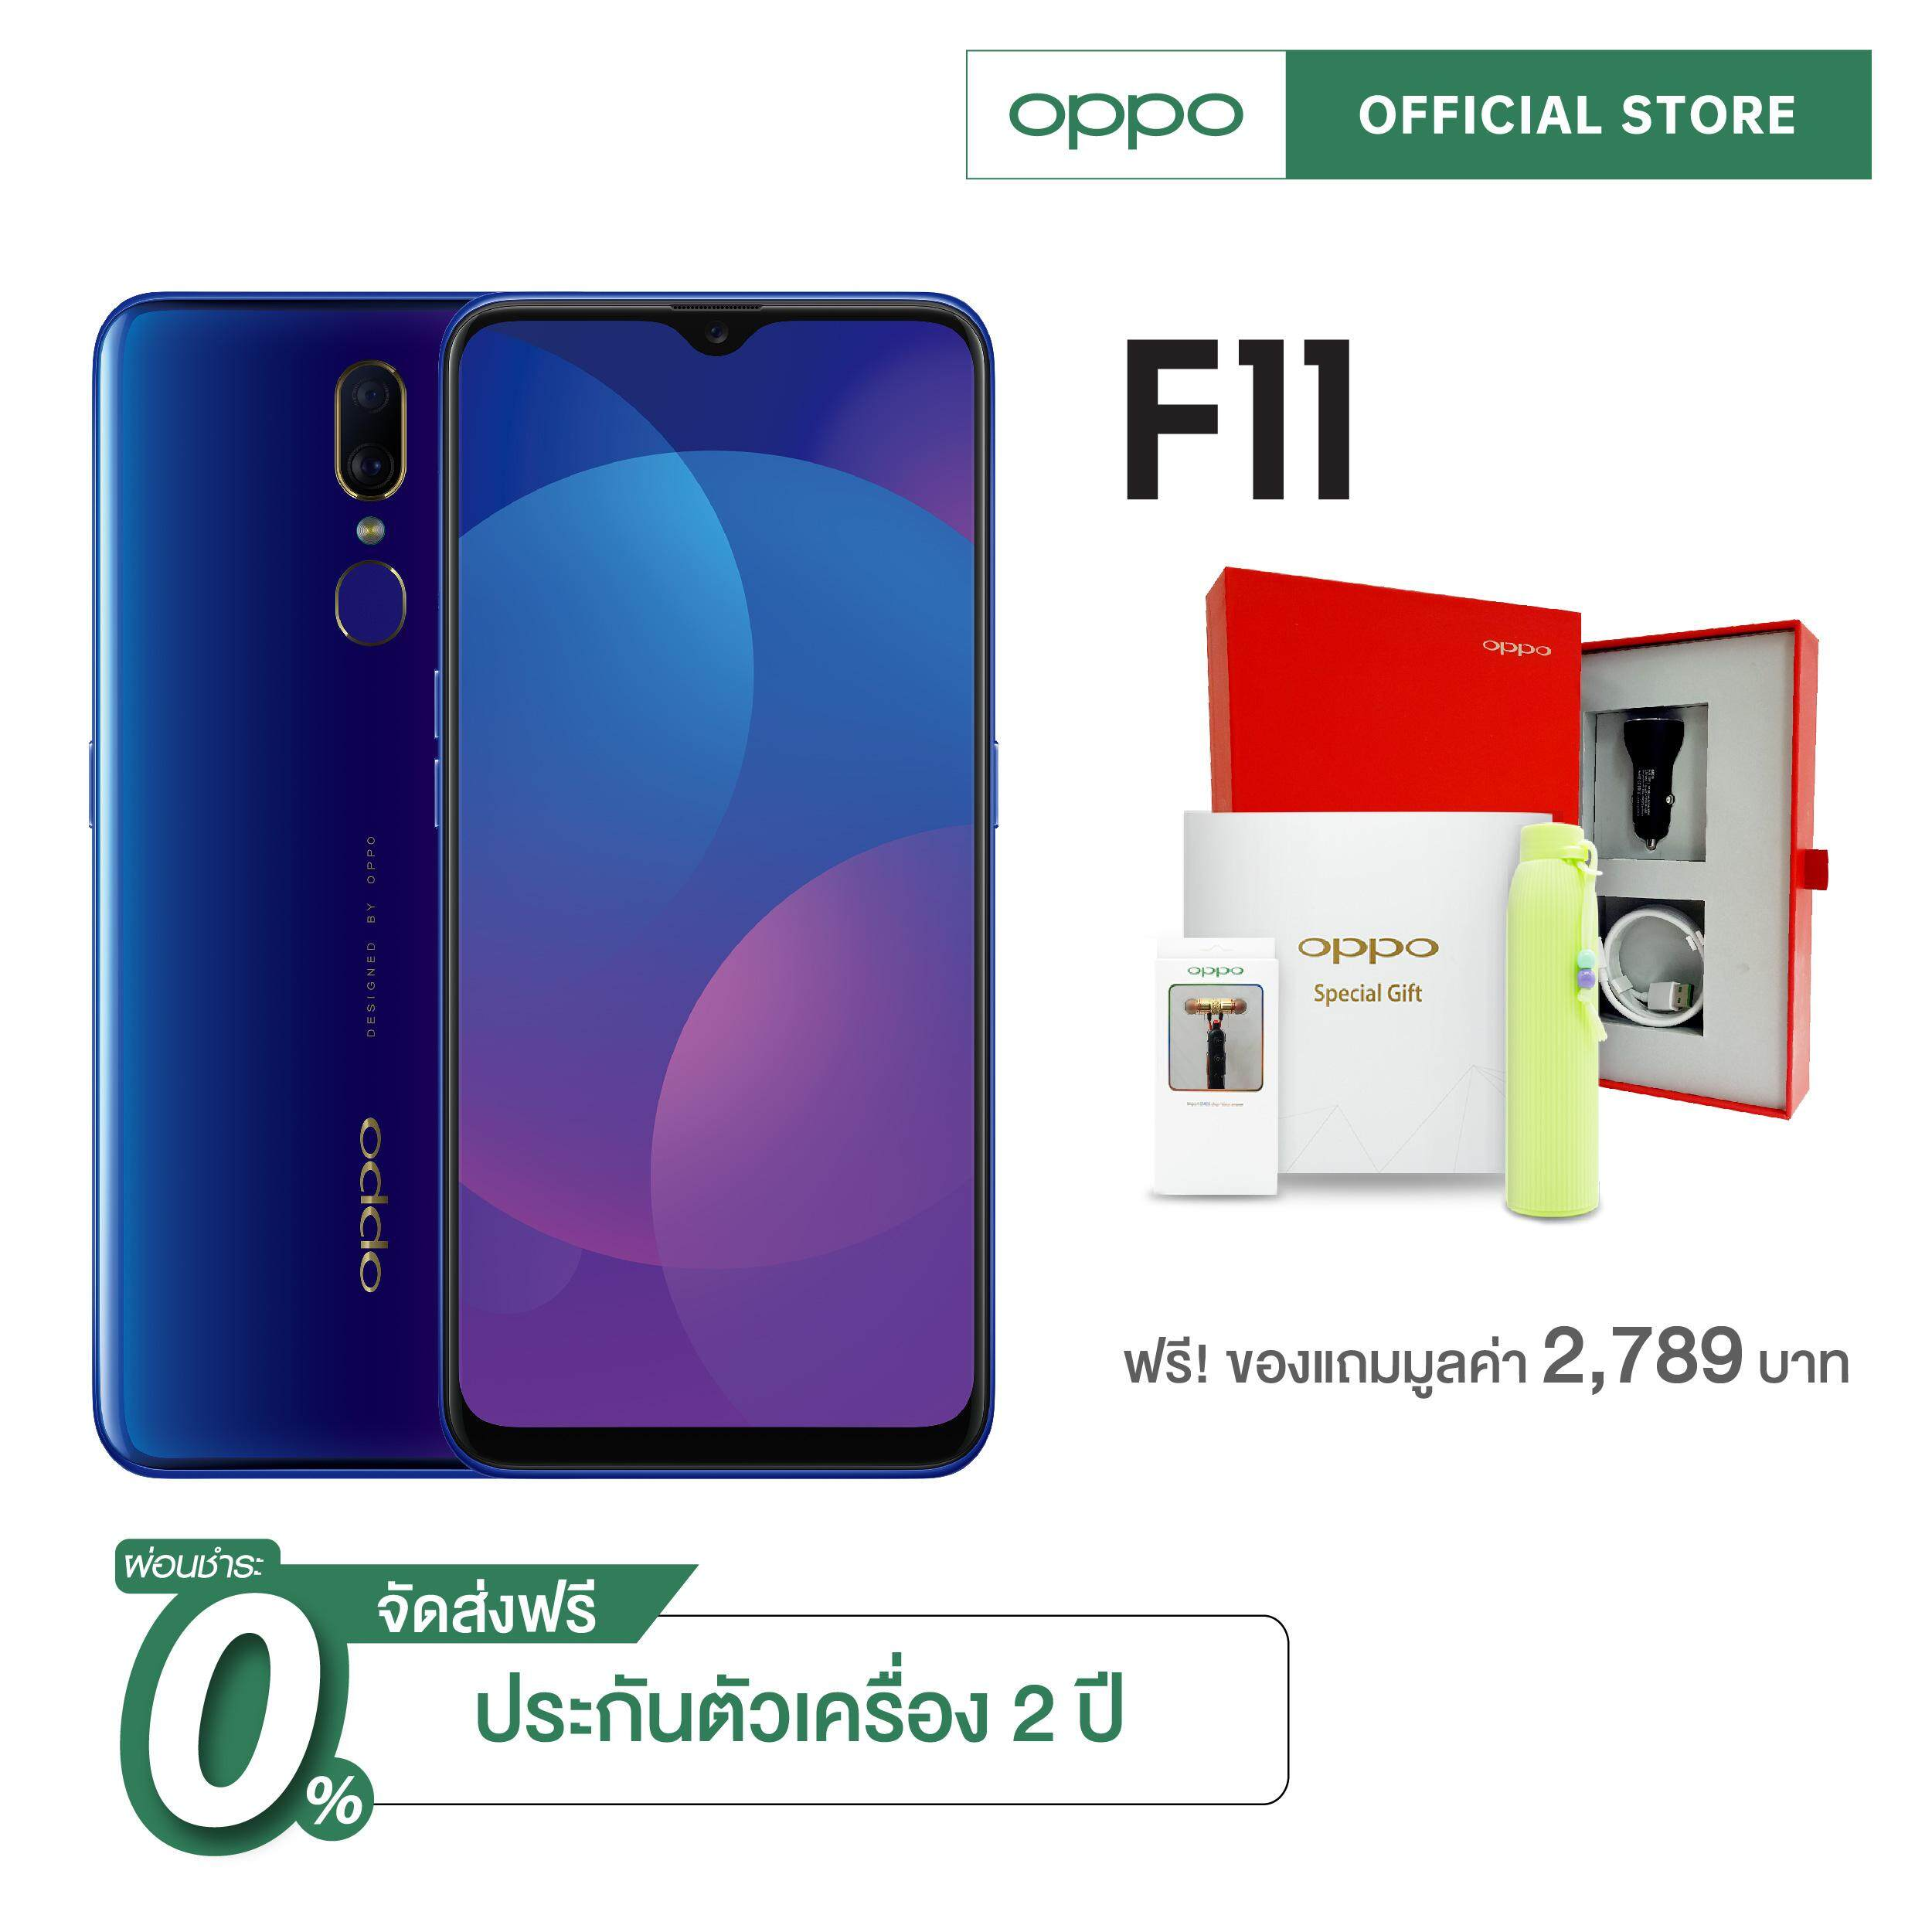 OPPO F11 4+128GB +สวยแม้แสงน้อย+กล้องหลังคู่ 48 MP+ 5MP+ VOOC Flash Charge+สีเขียว+สีน้ำเงิน OPPO F11 Series จัดราคาพิเศษต้อนรับวันแม่ - OPPO F11 Series จัดราคาพิเศษต้อนรับวันแม่